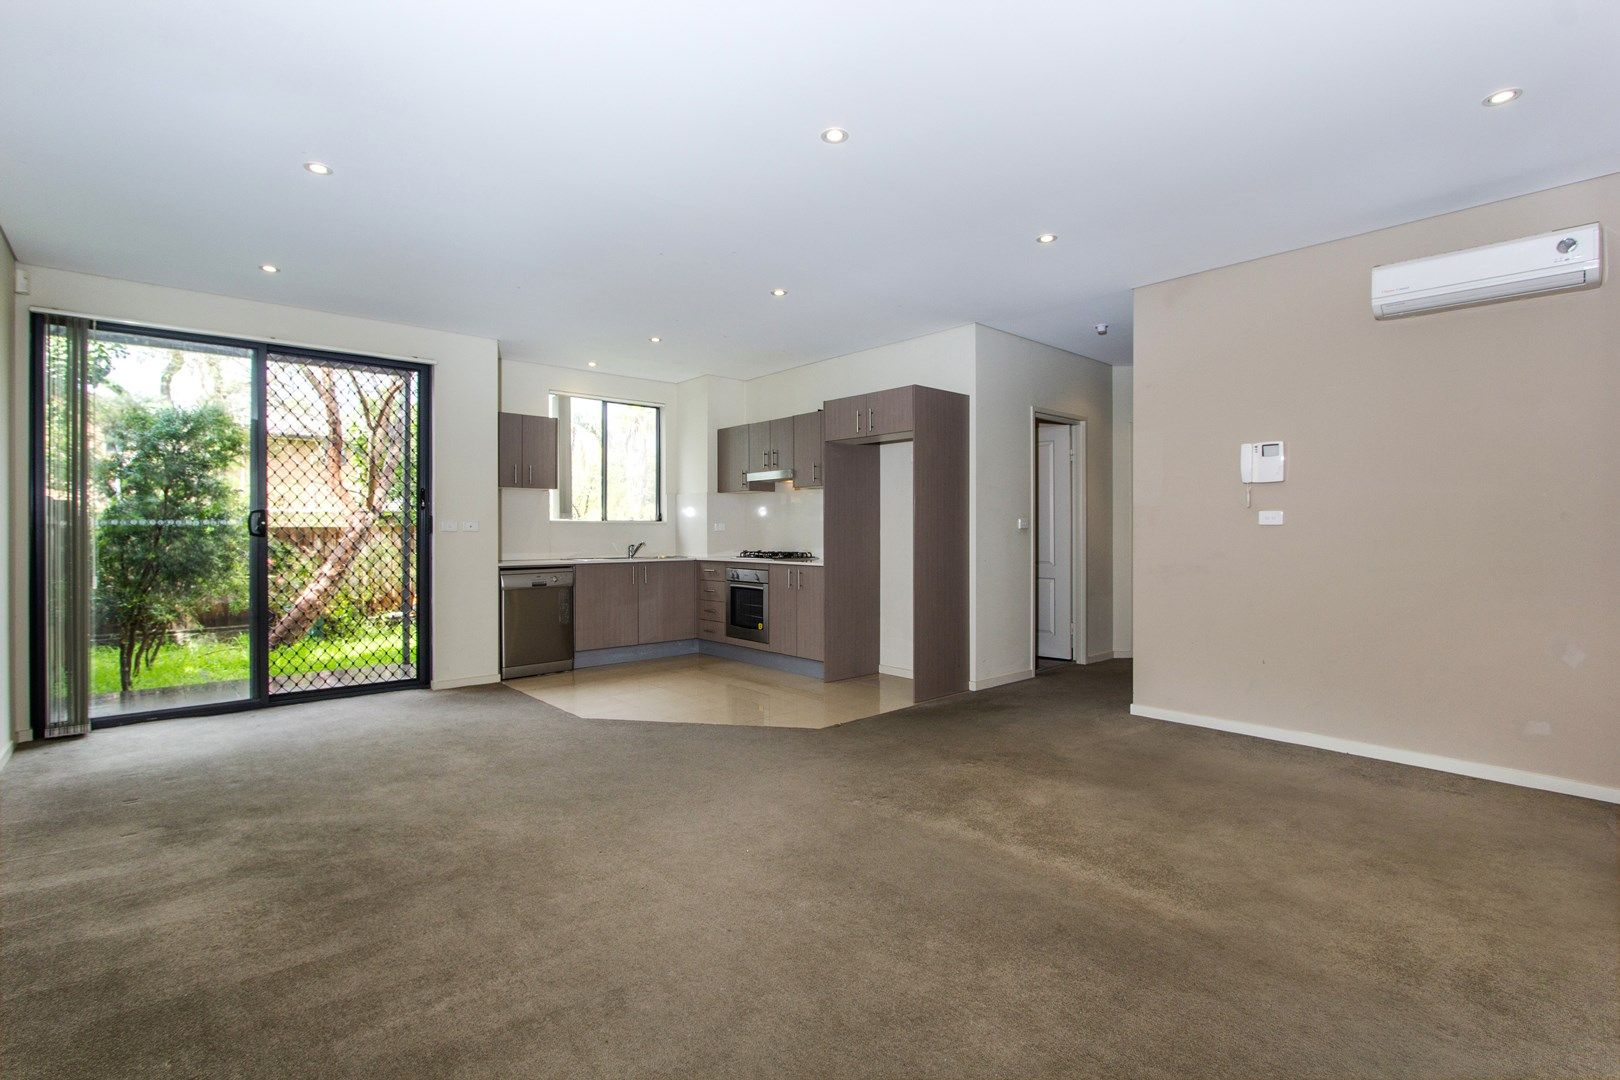 23/46-52  Macarthur street, Parramatta NSW 2150, Image 0